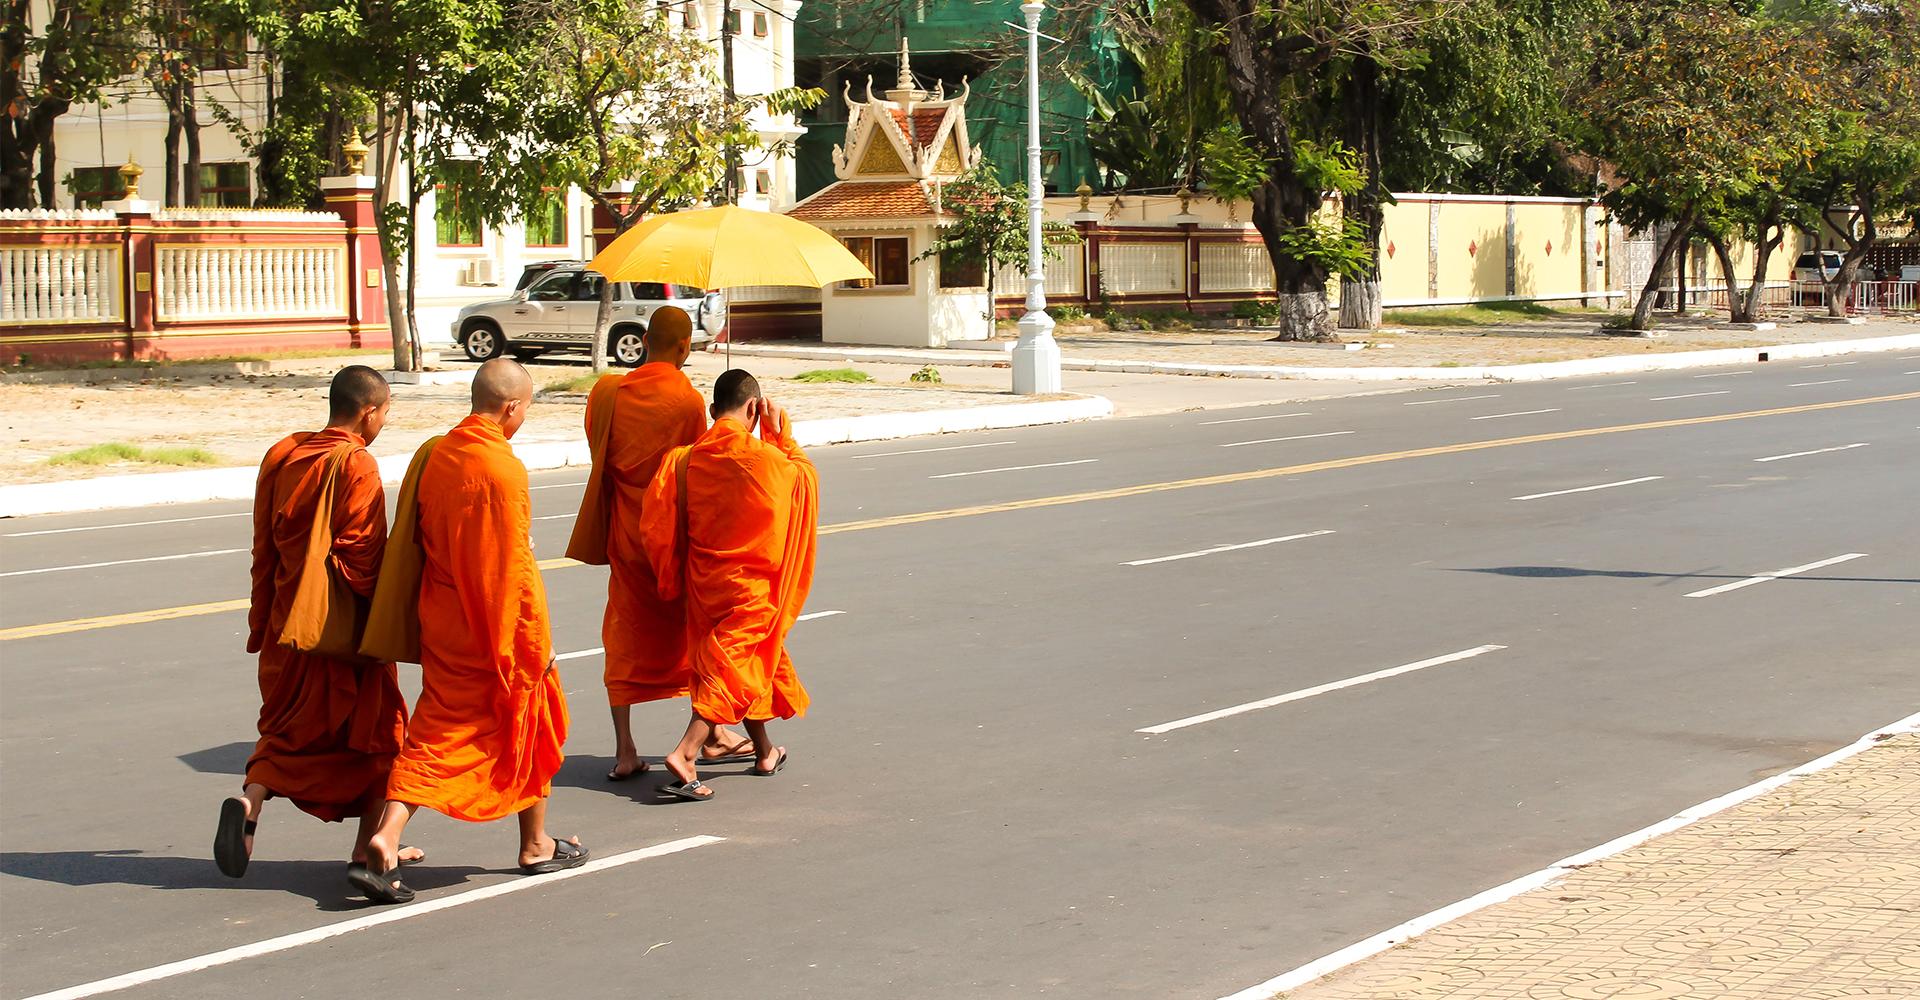 Monjes budistas de Camboya